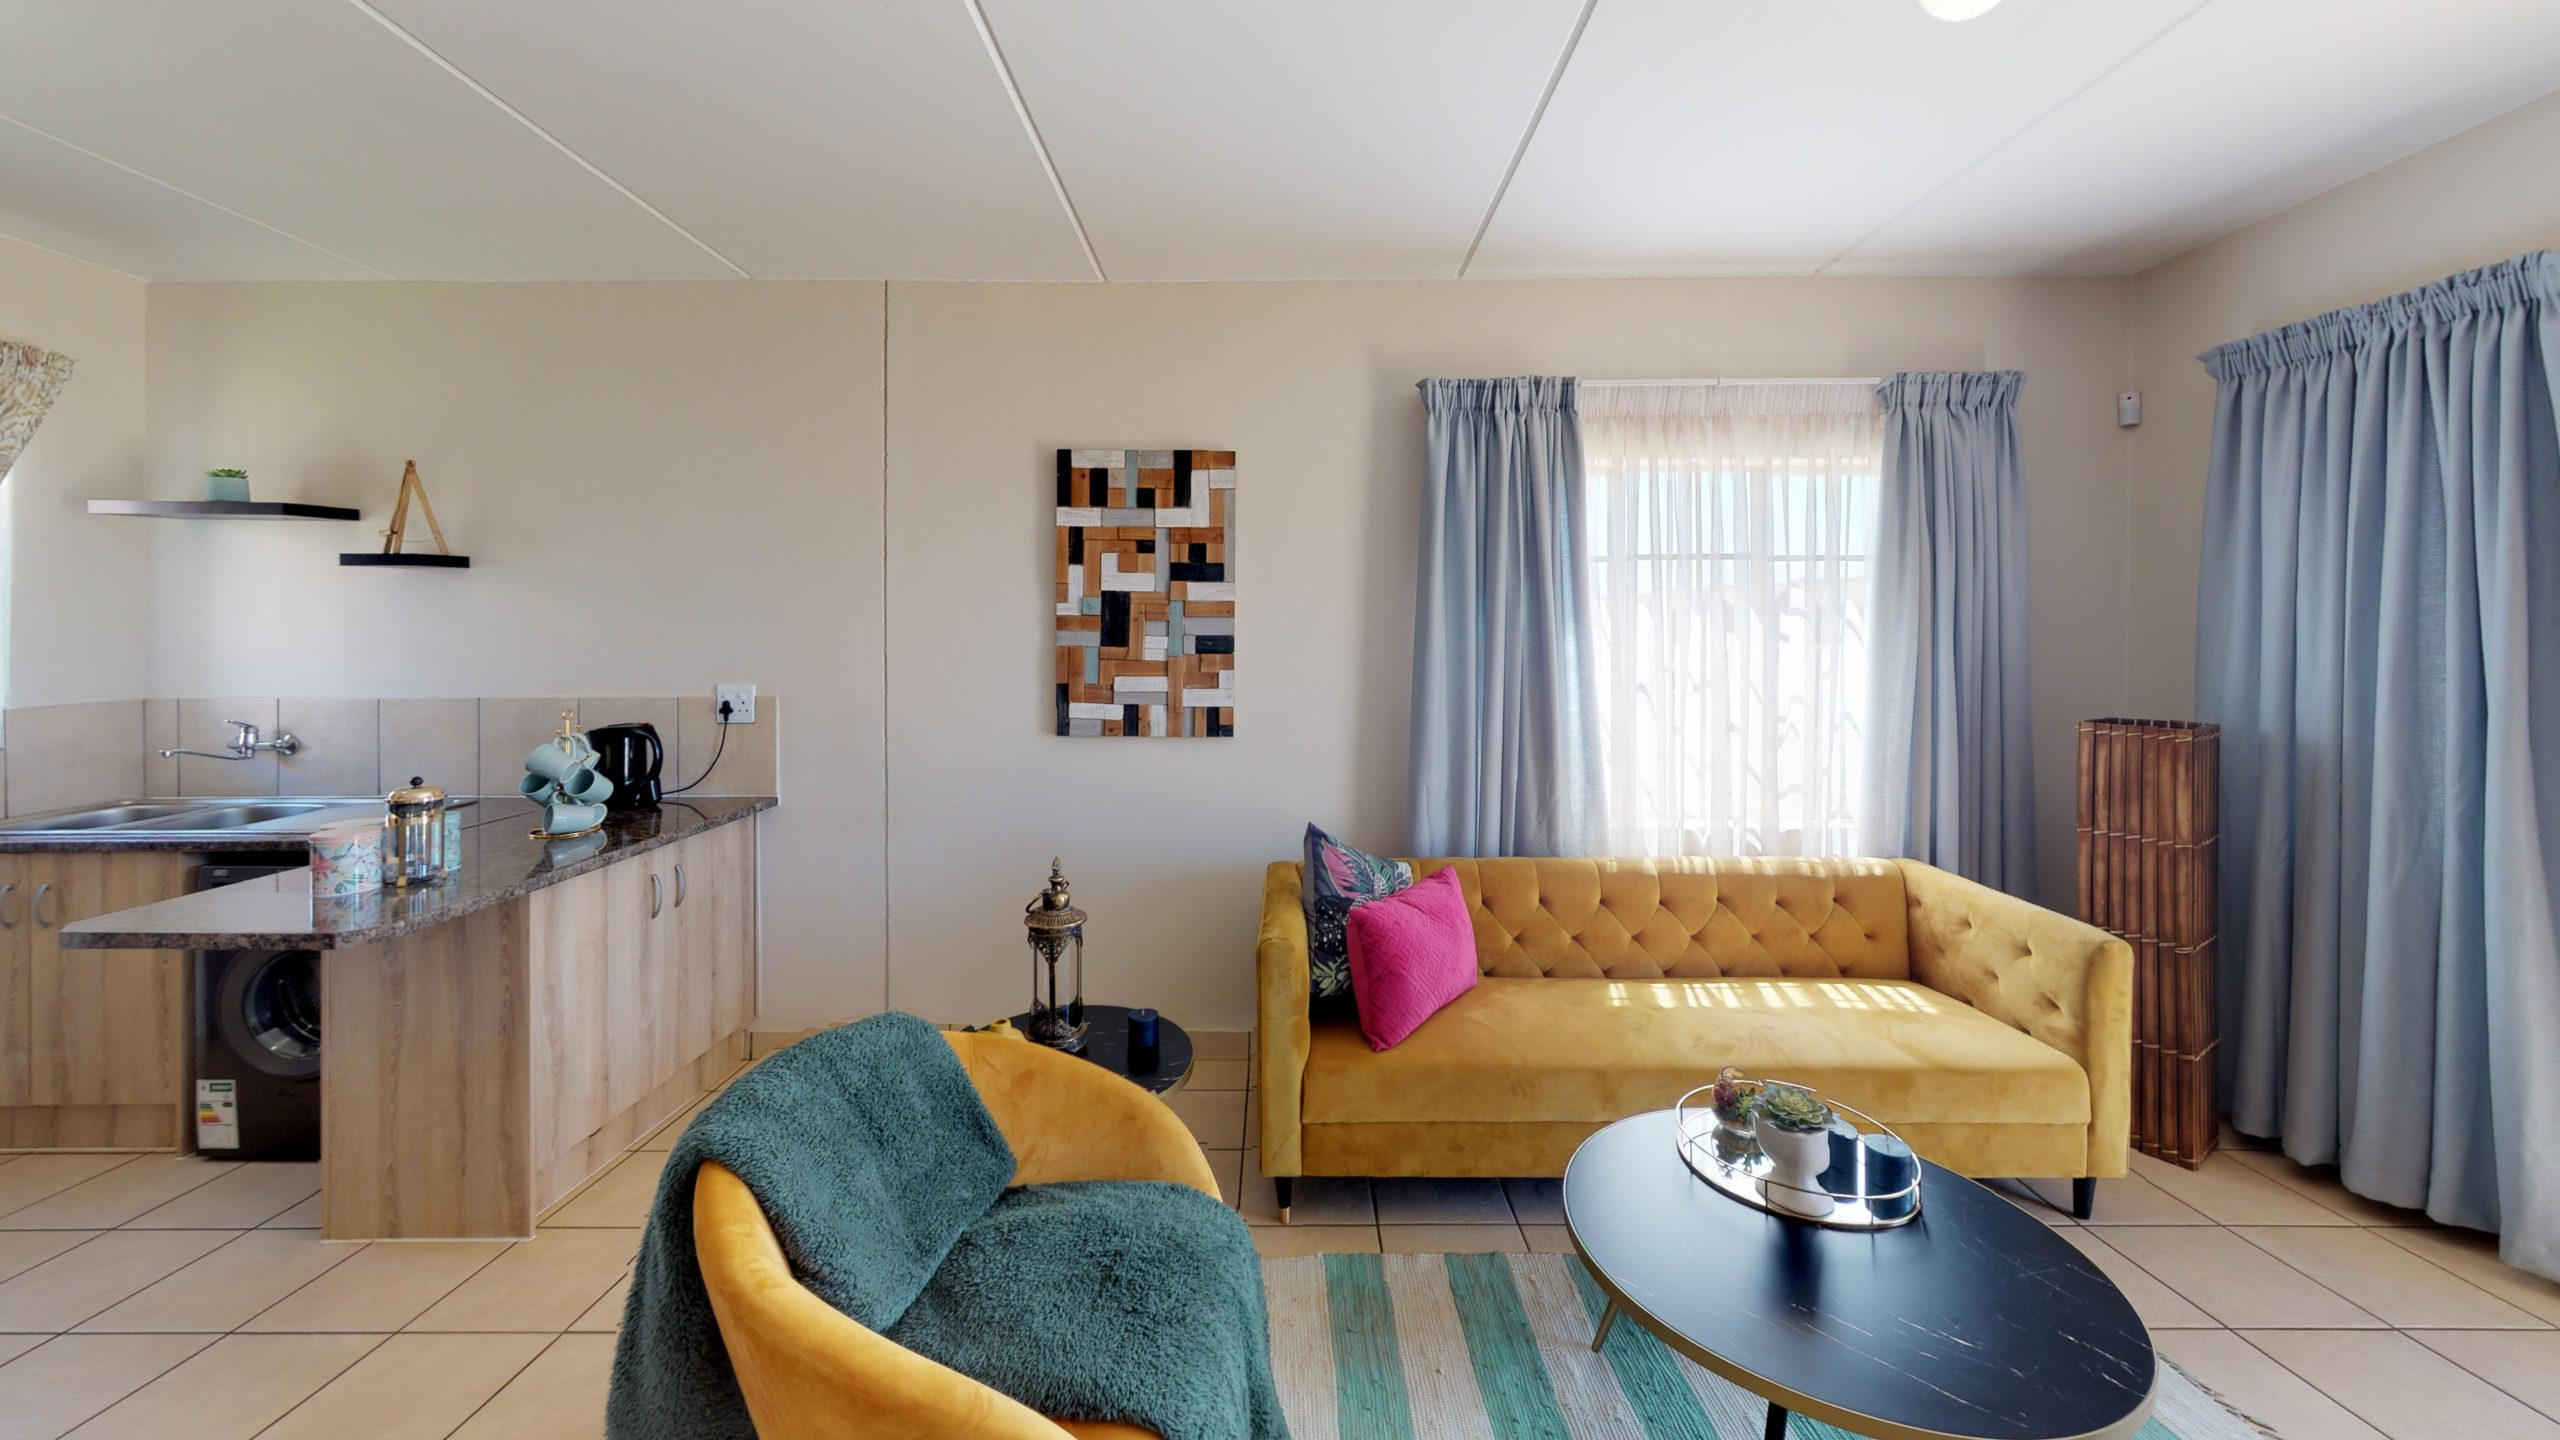 Sky City, Homes for Sale in Alberton, Gauteng - Lounge